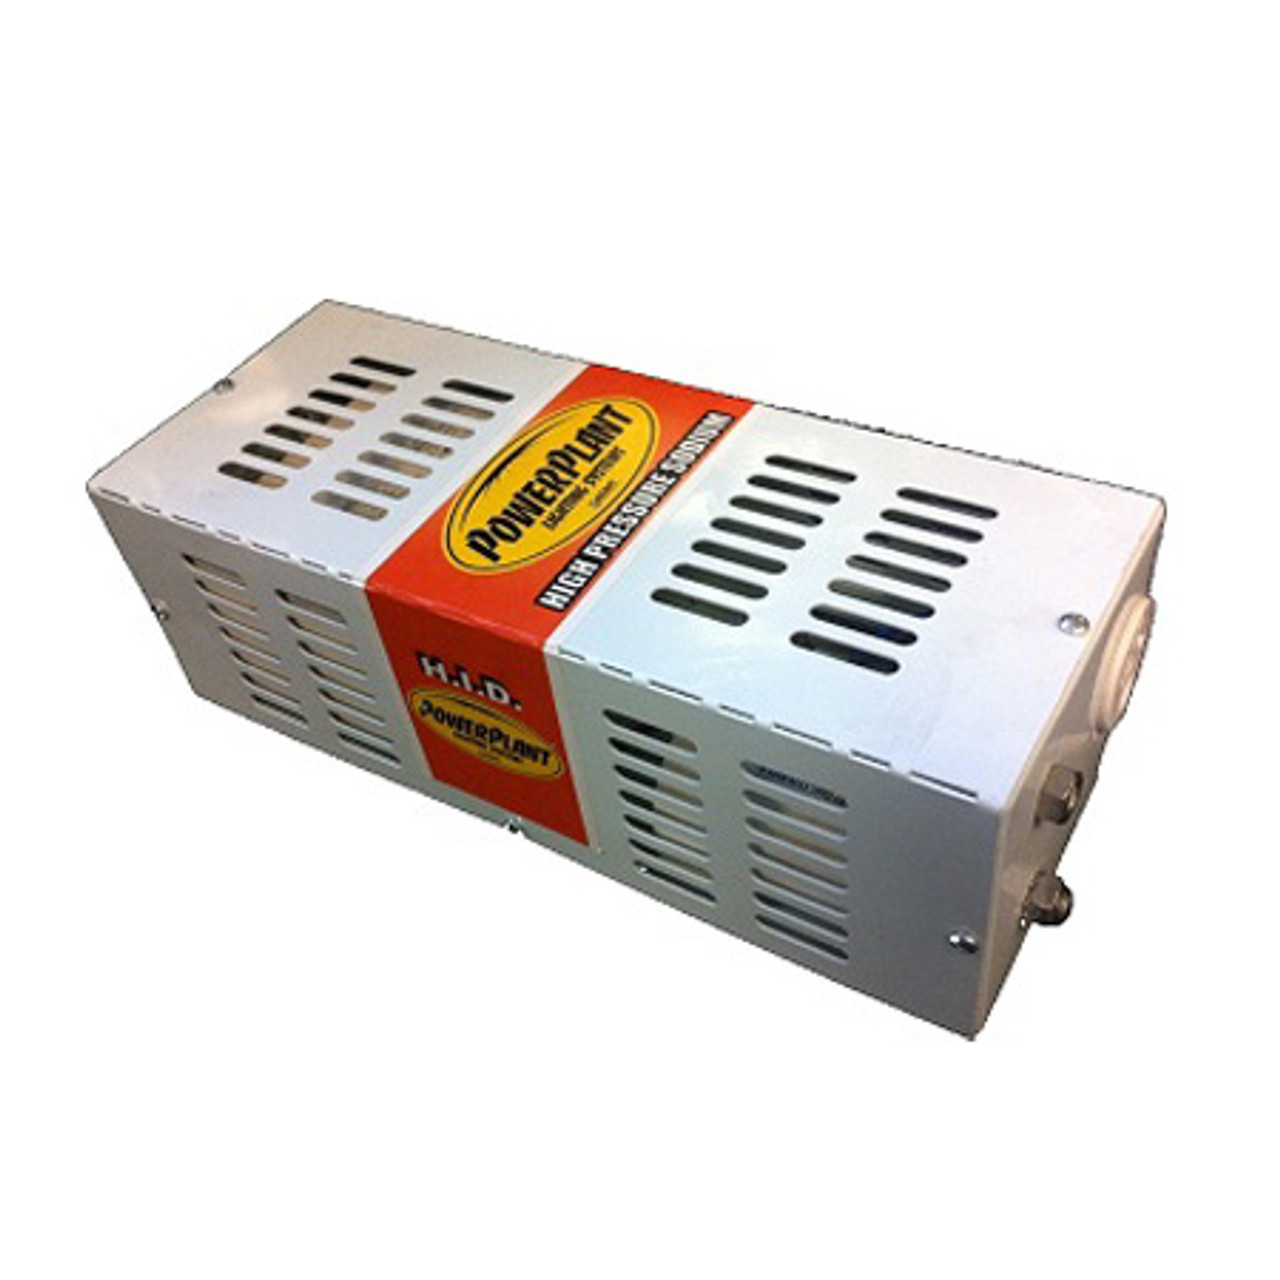 POWERPLANT 400 WATT HPS COPPER COIL BALLAST (AUST)